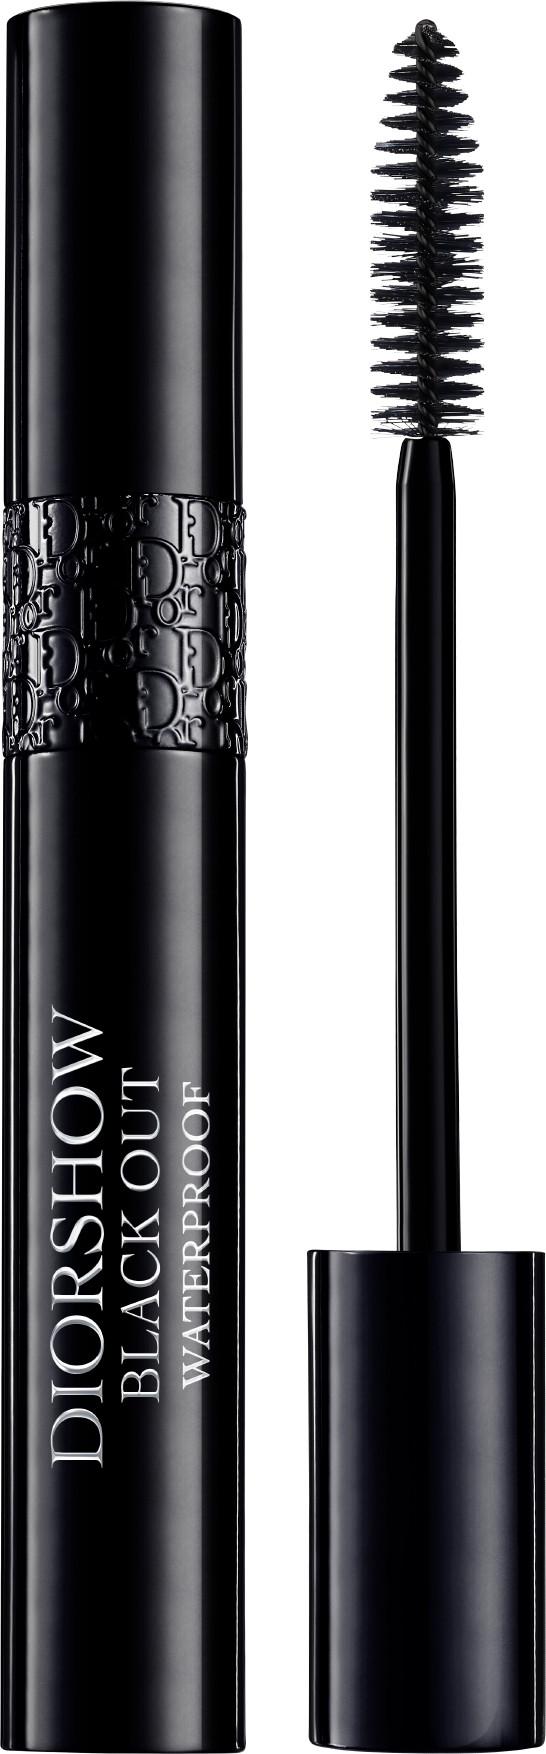 Dior Diorshow Black Out Waterproof 10ml - 099 Khol Black